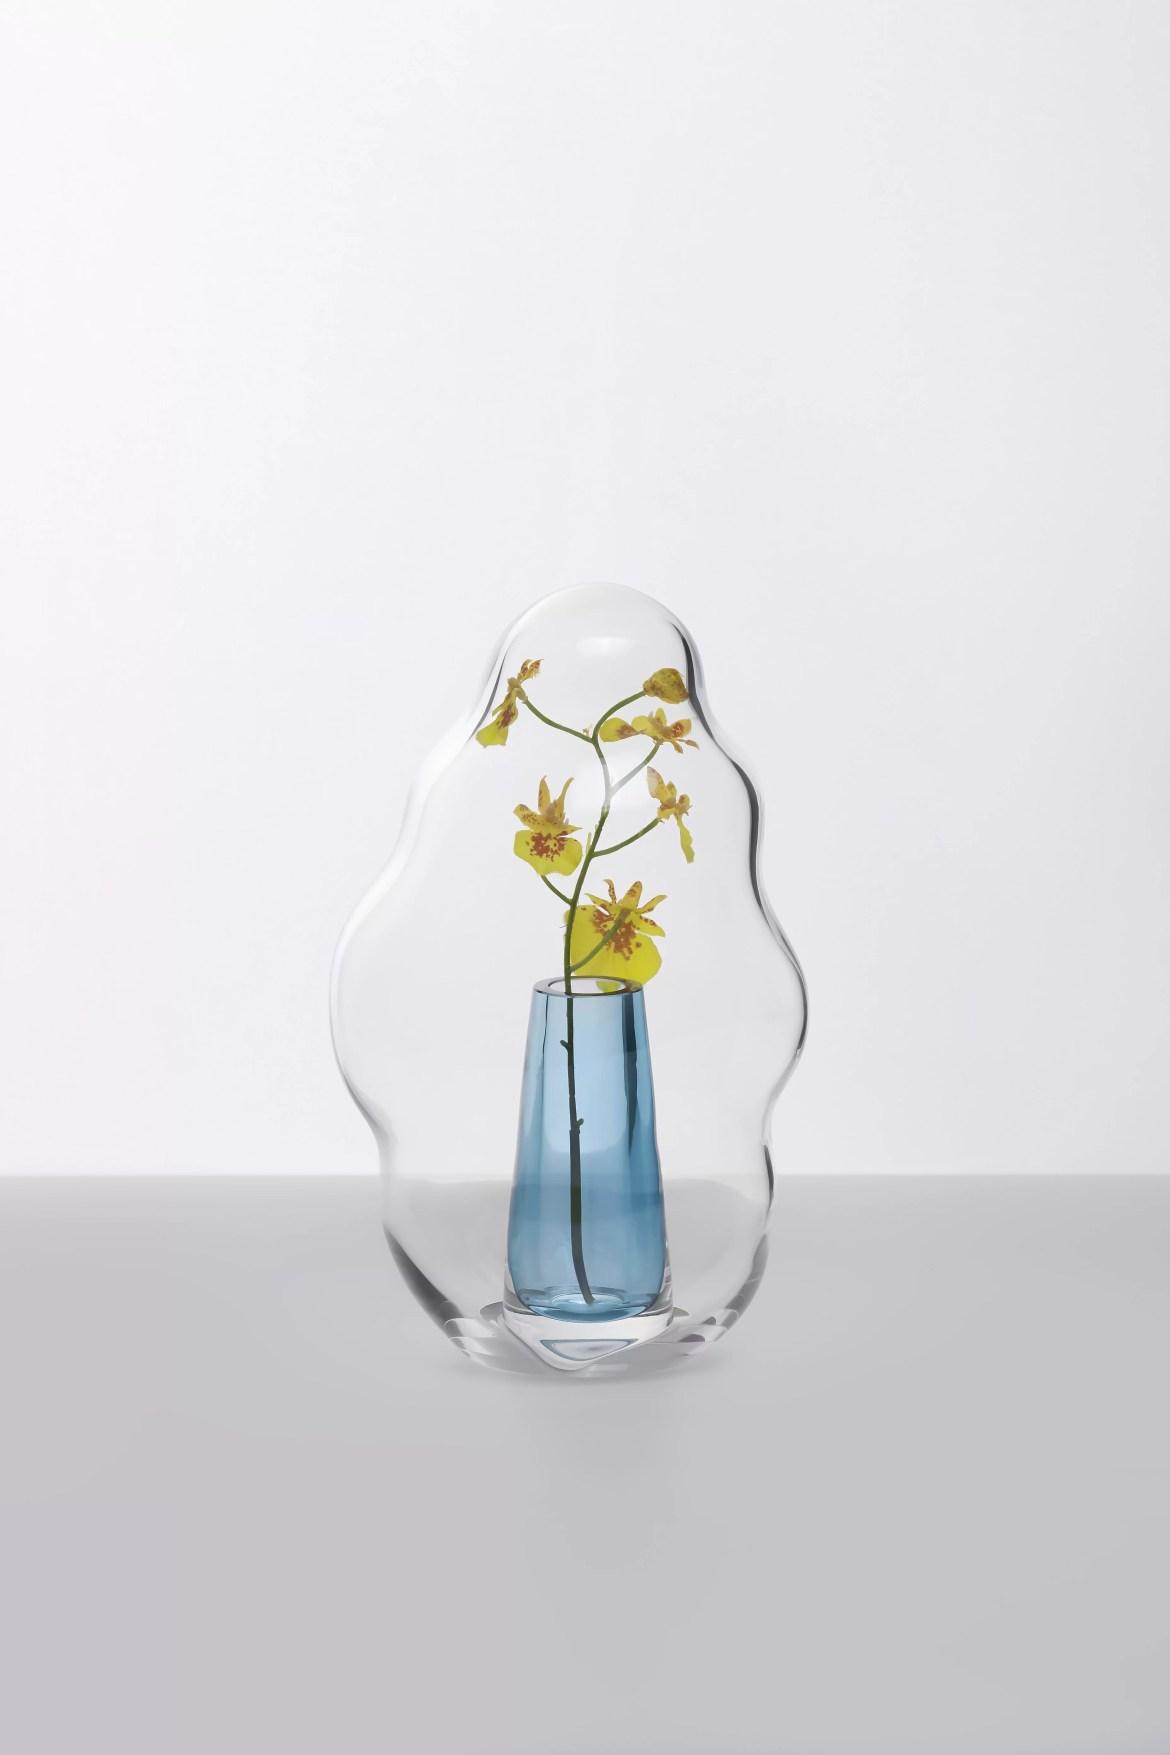 1000 Vases at Paris Design Week 2019